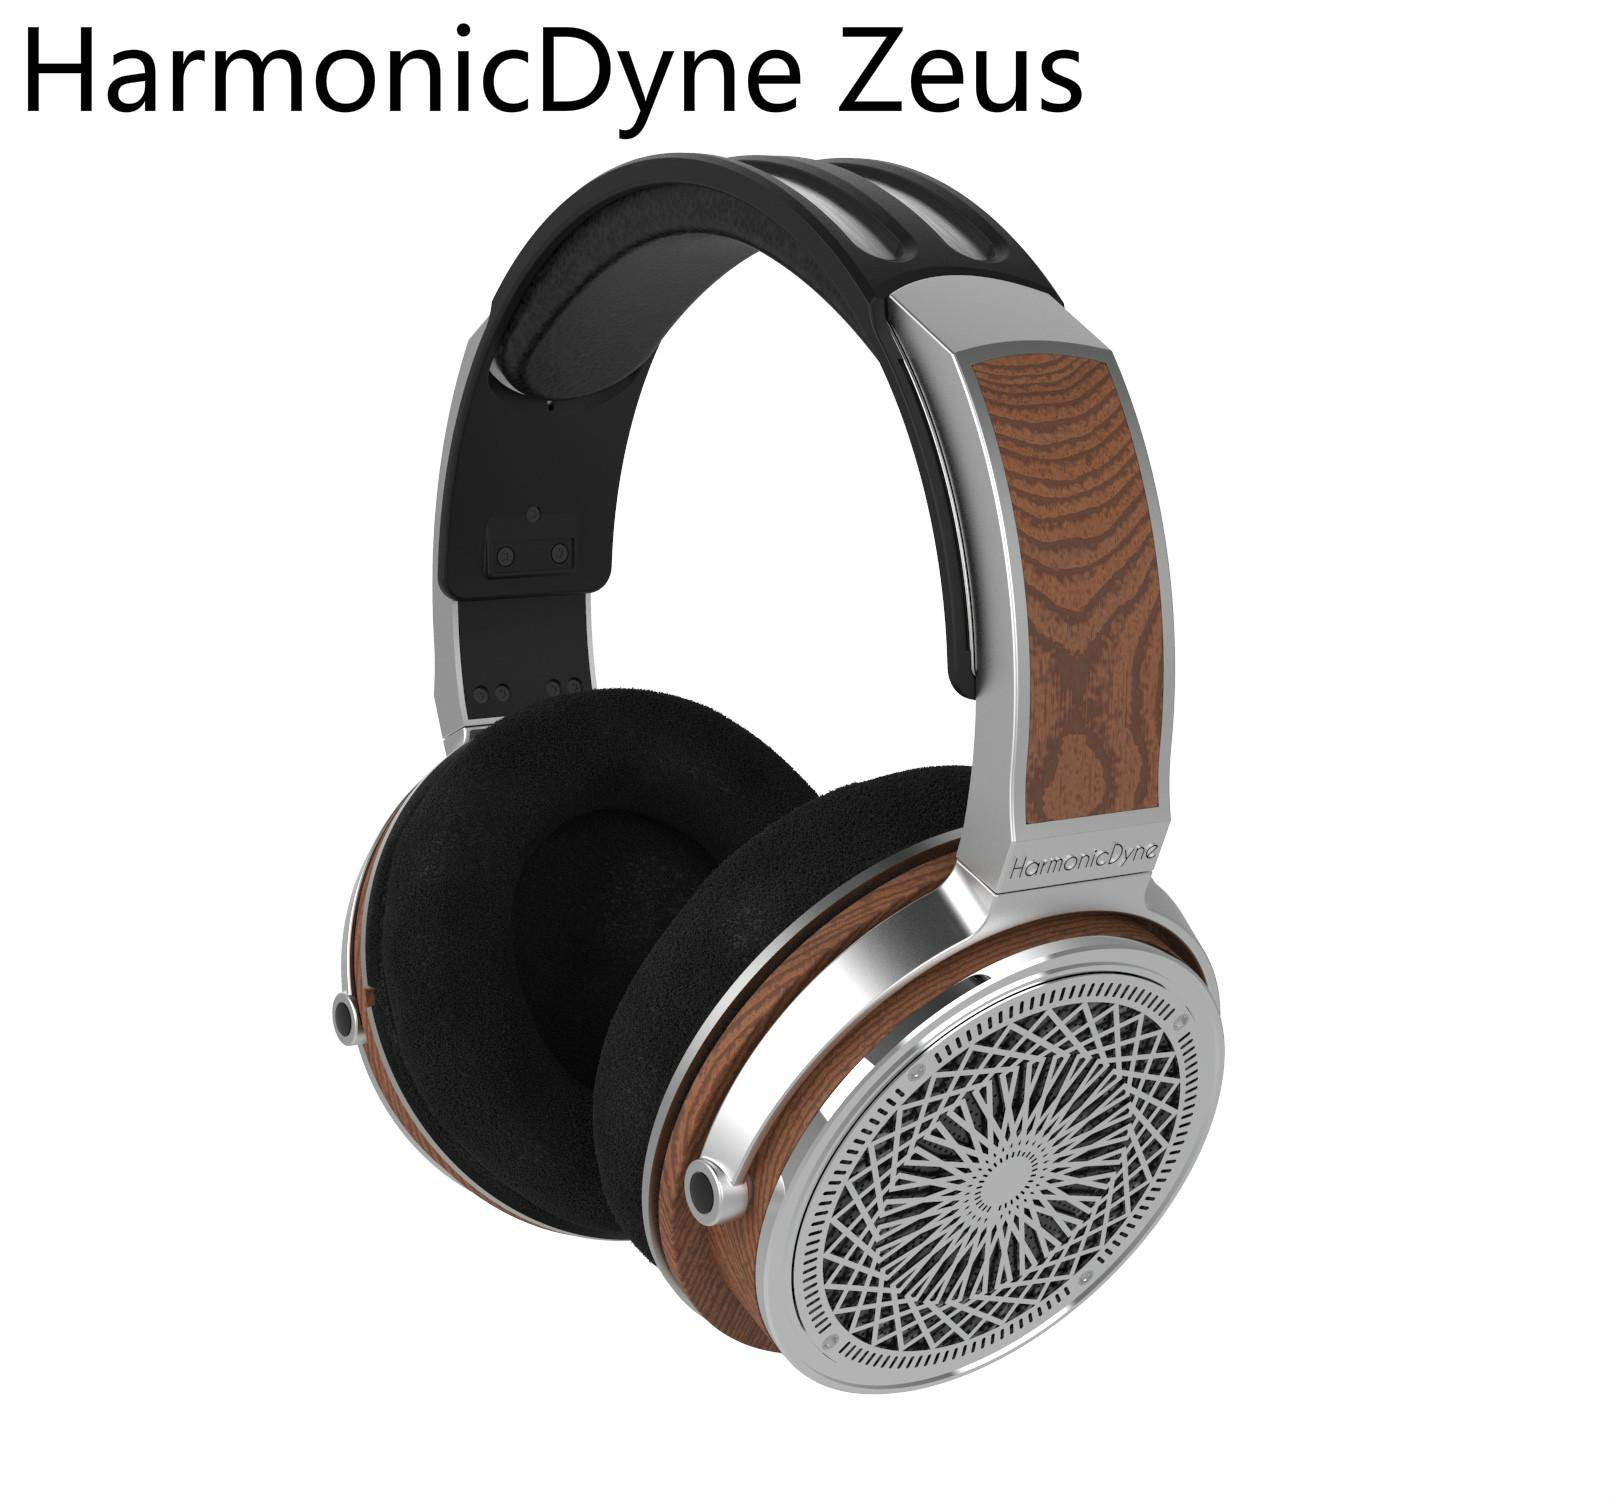 Haraicdyne-سماعات Zeus الصوتية ، سماعات رأس استريو ، صوت 50 مللي متر ، hi-fi ، صوت عالي الدقة ، استوديو DJ ، للموسيقي فوق الرأس ، MMCX